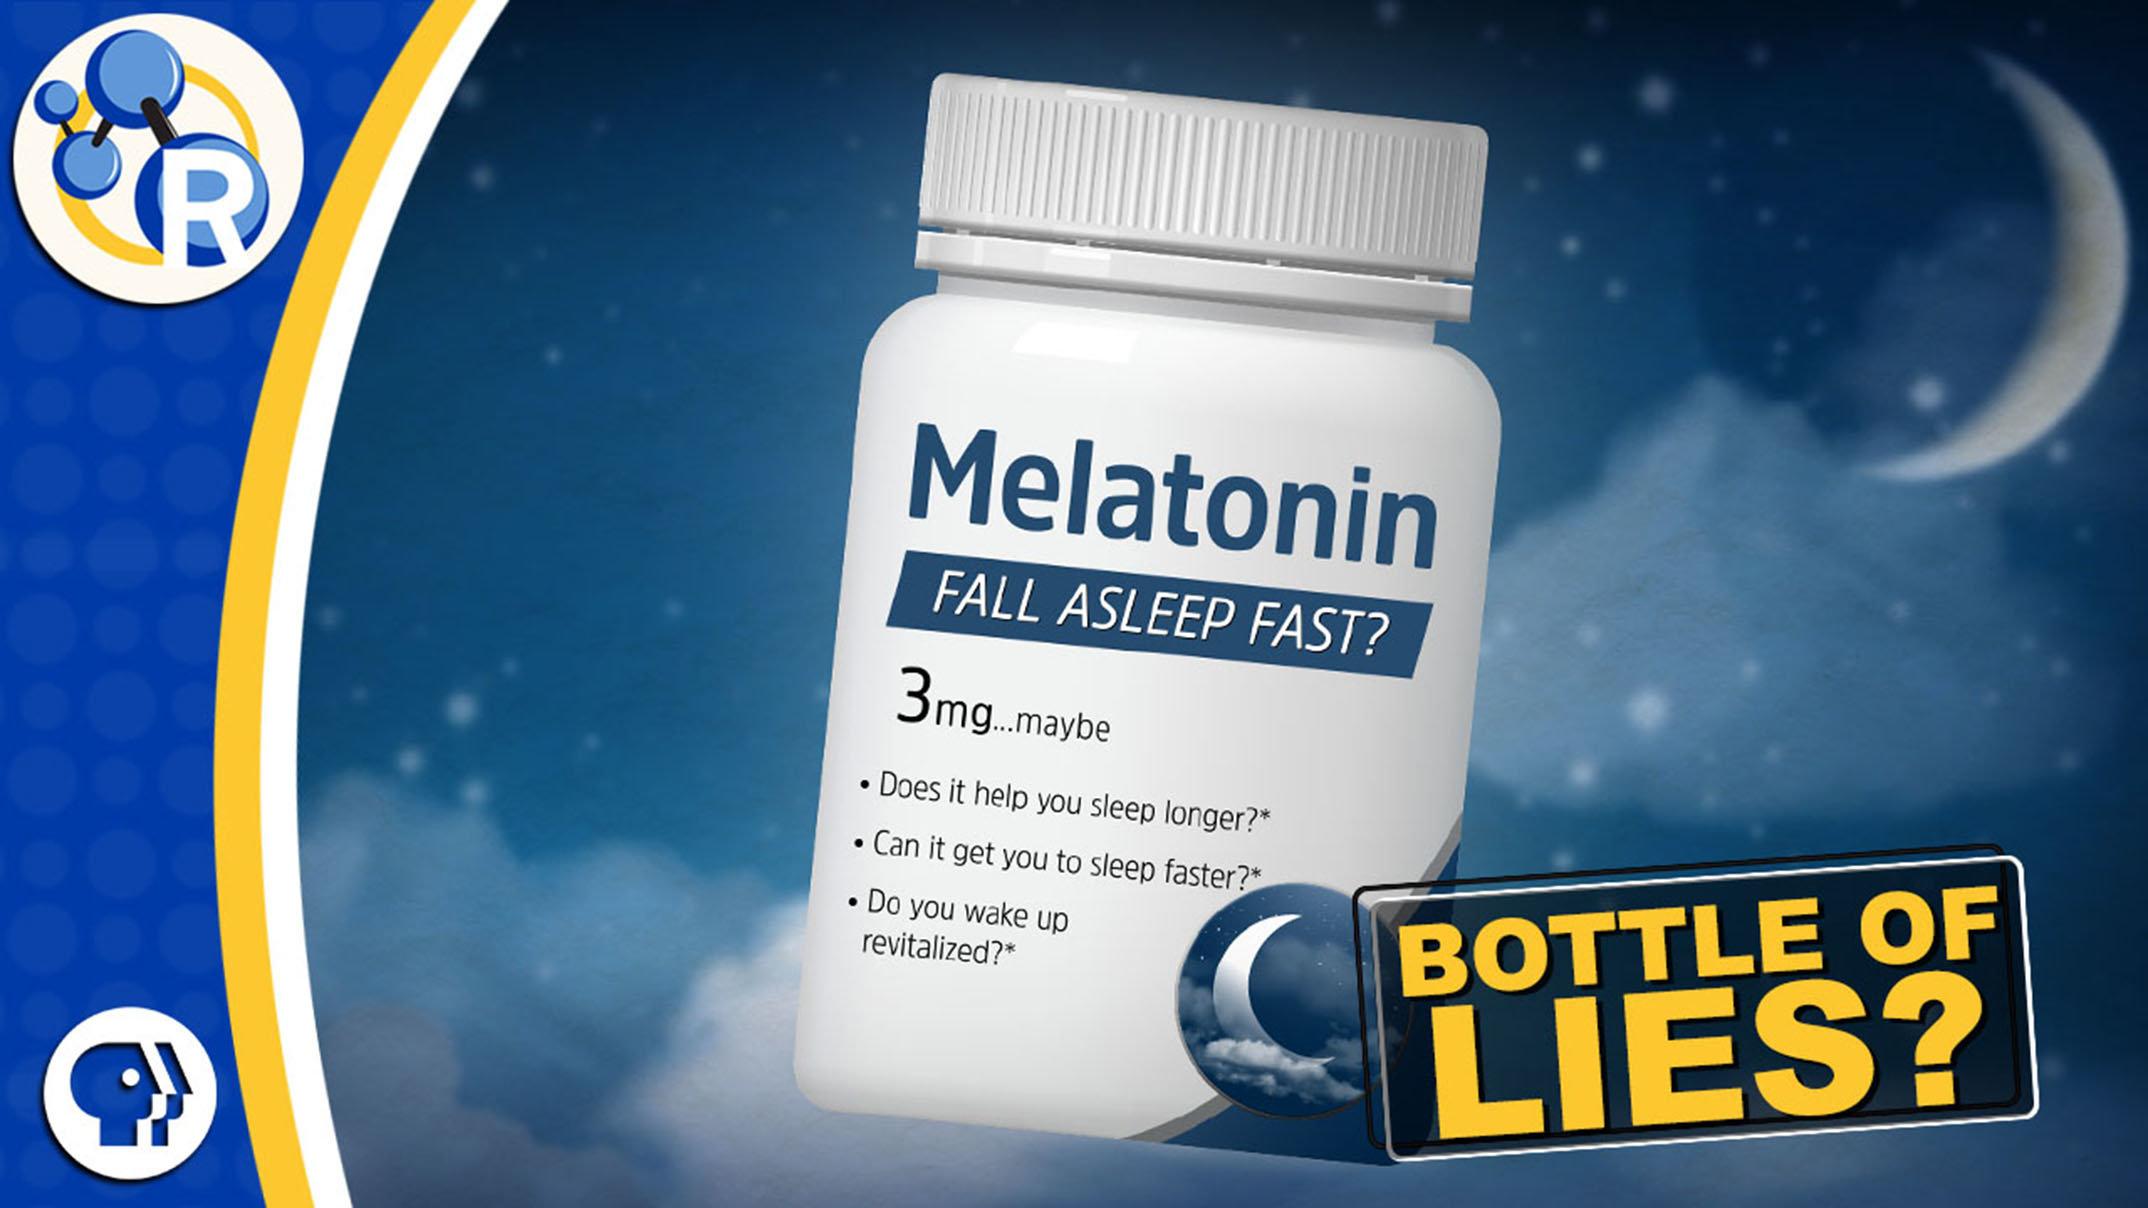 video: does melatonin do anything?